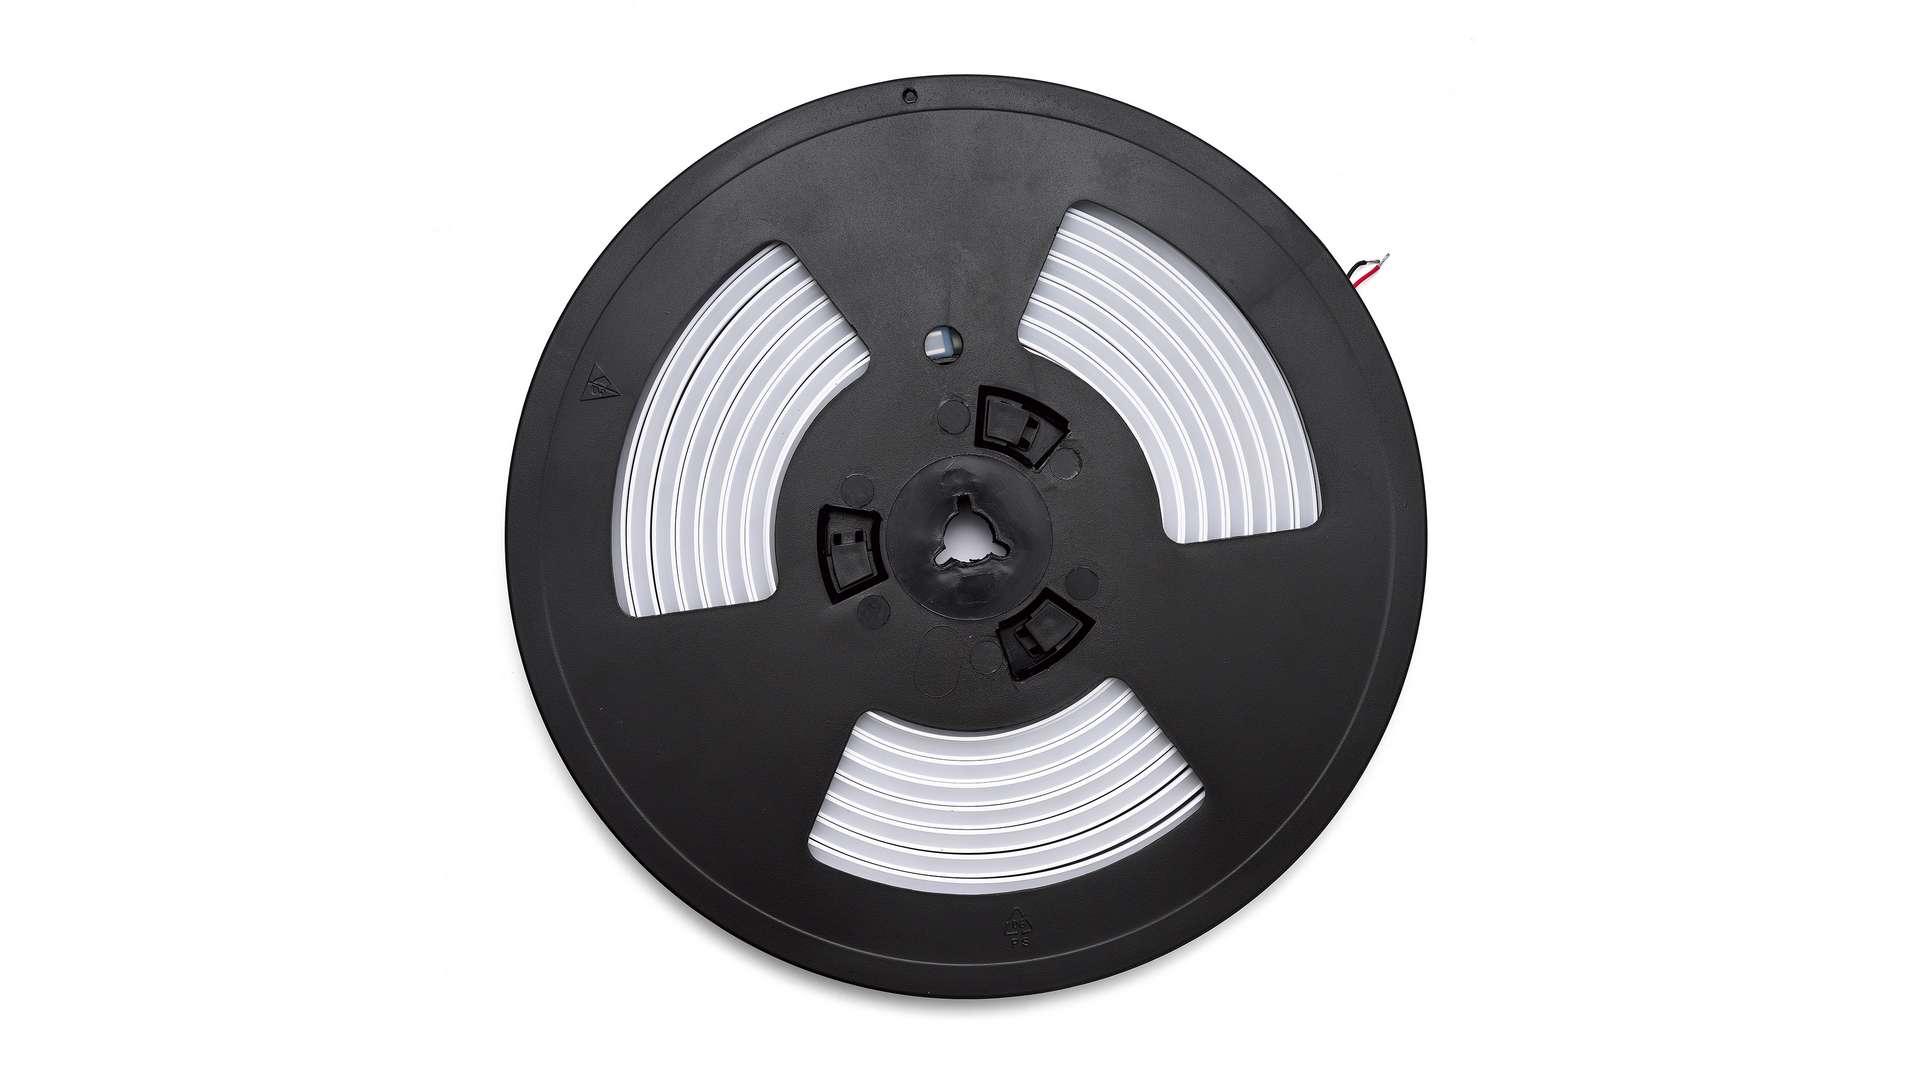 LED Neon Flex 3Y 6x12 140 LED/m 10,8W/m 24V Cold white